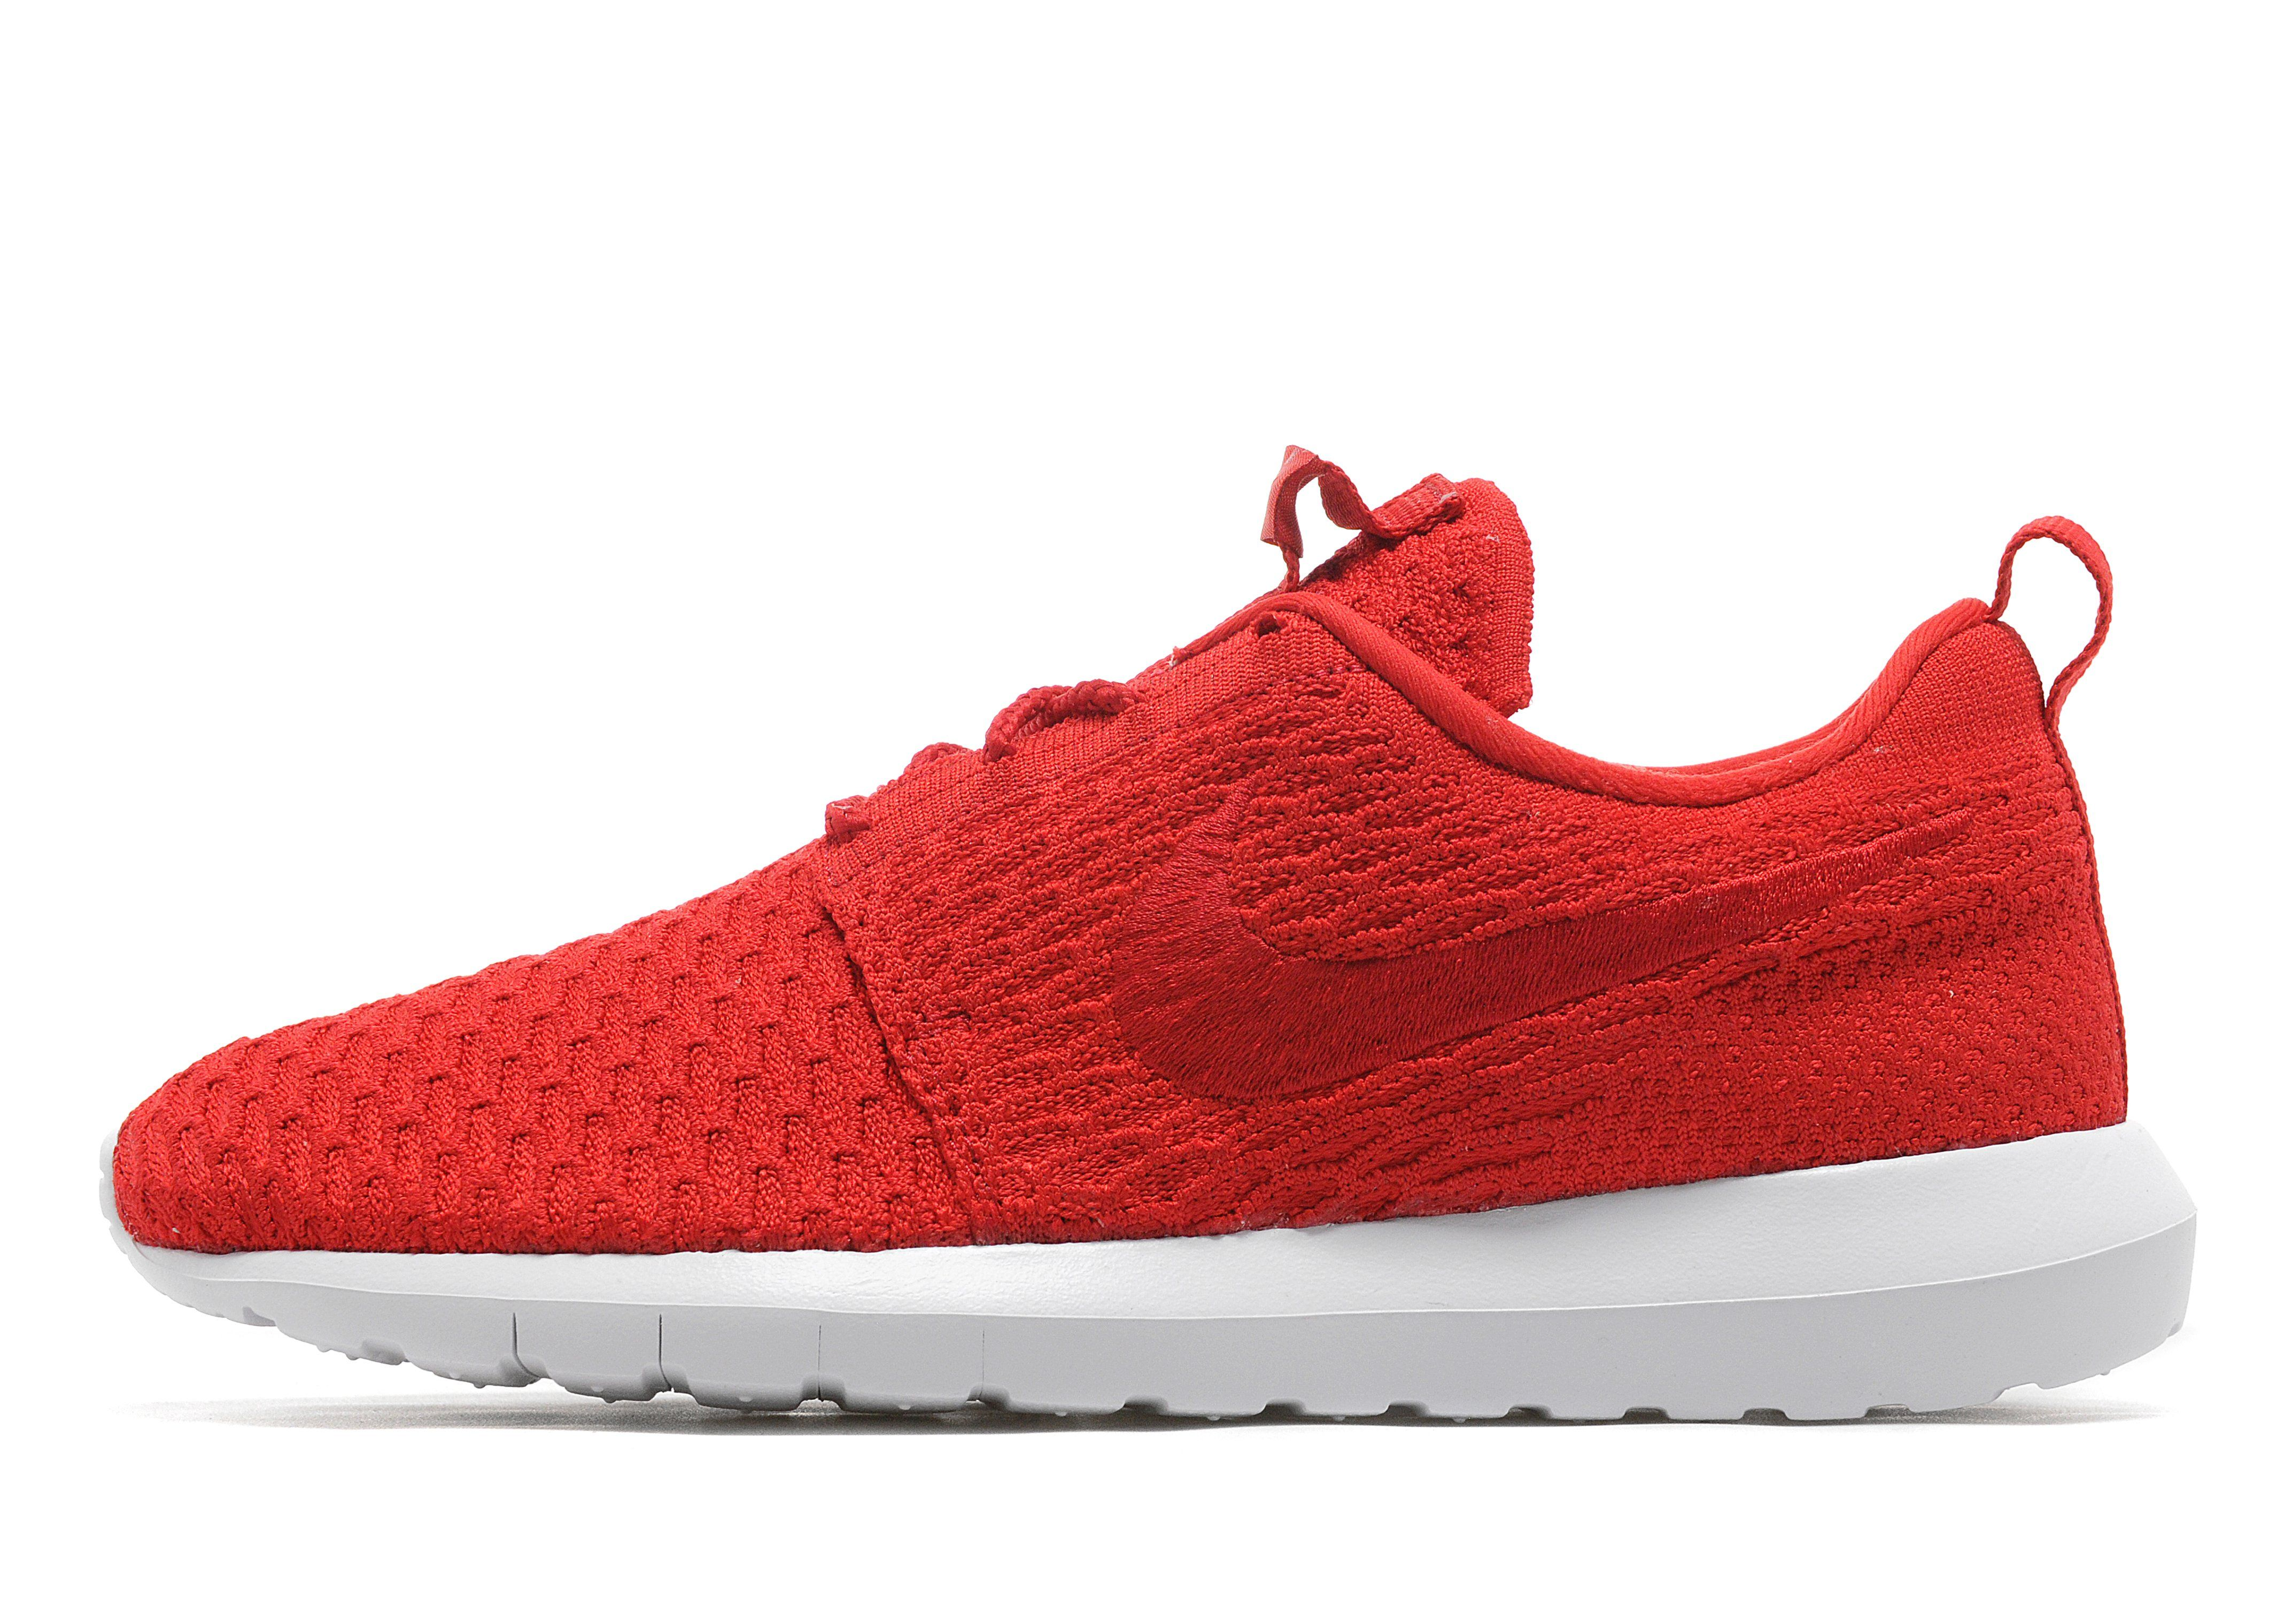 ulill Nike Roshe One Flyknit | JD Sports